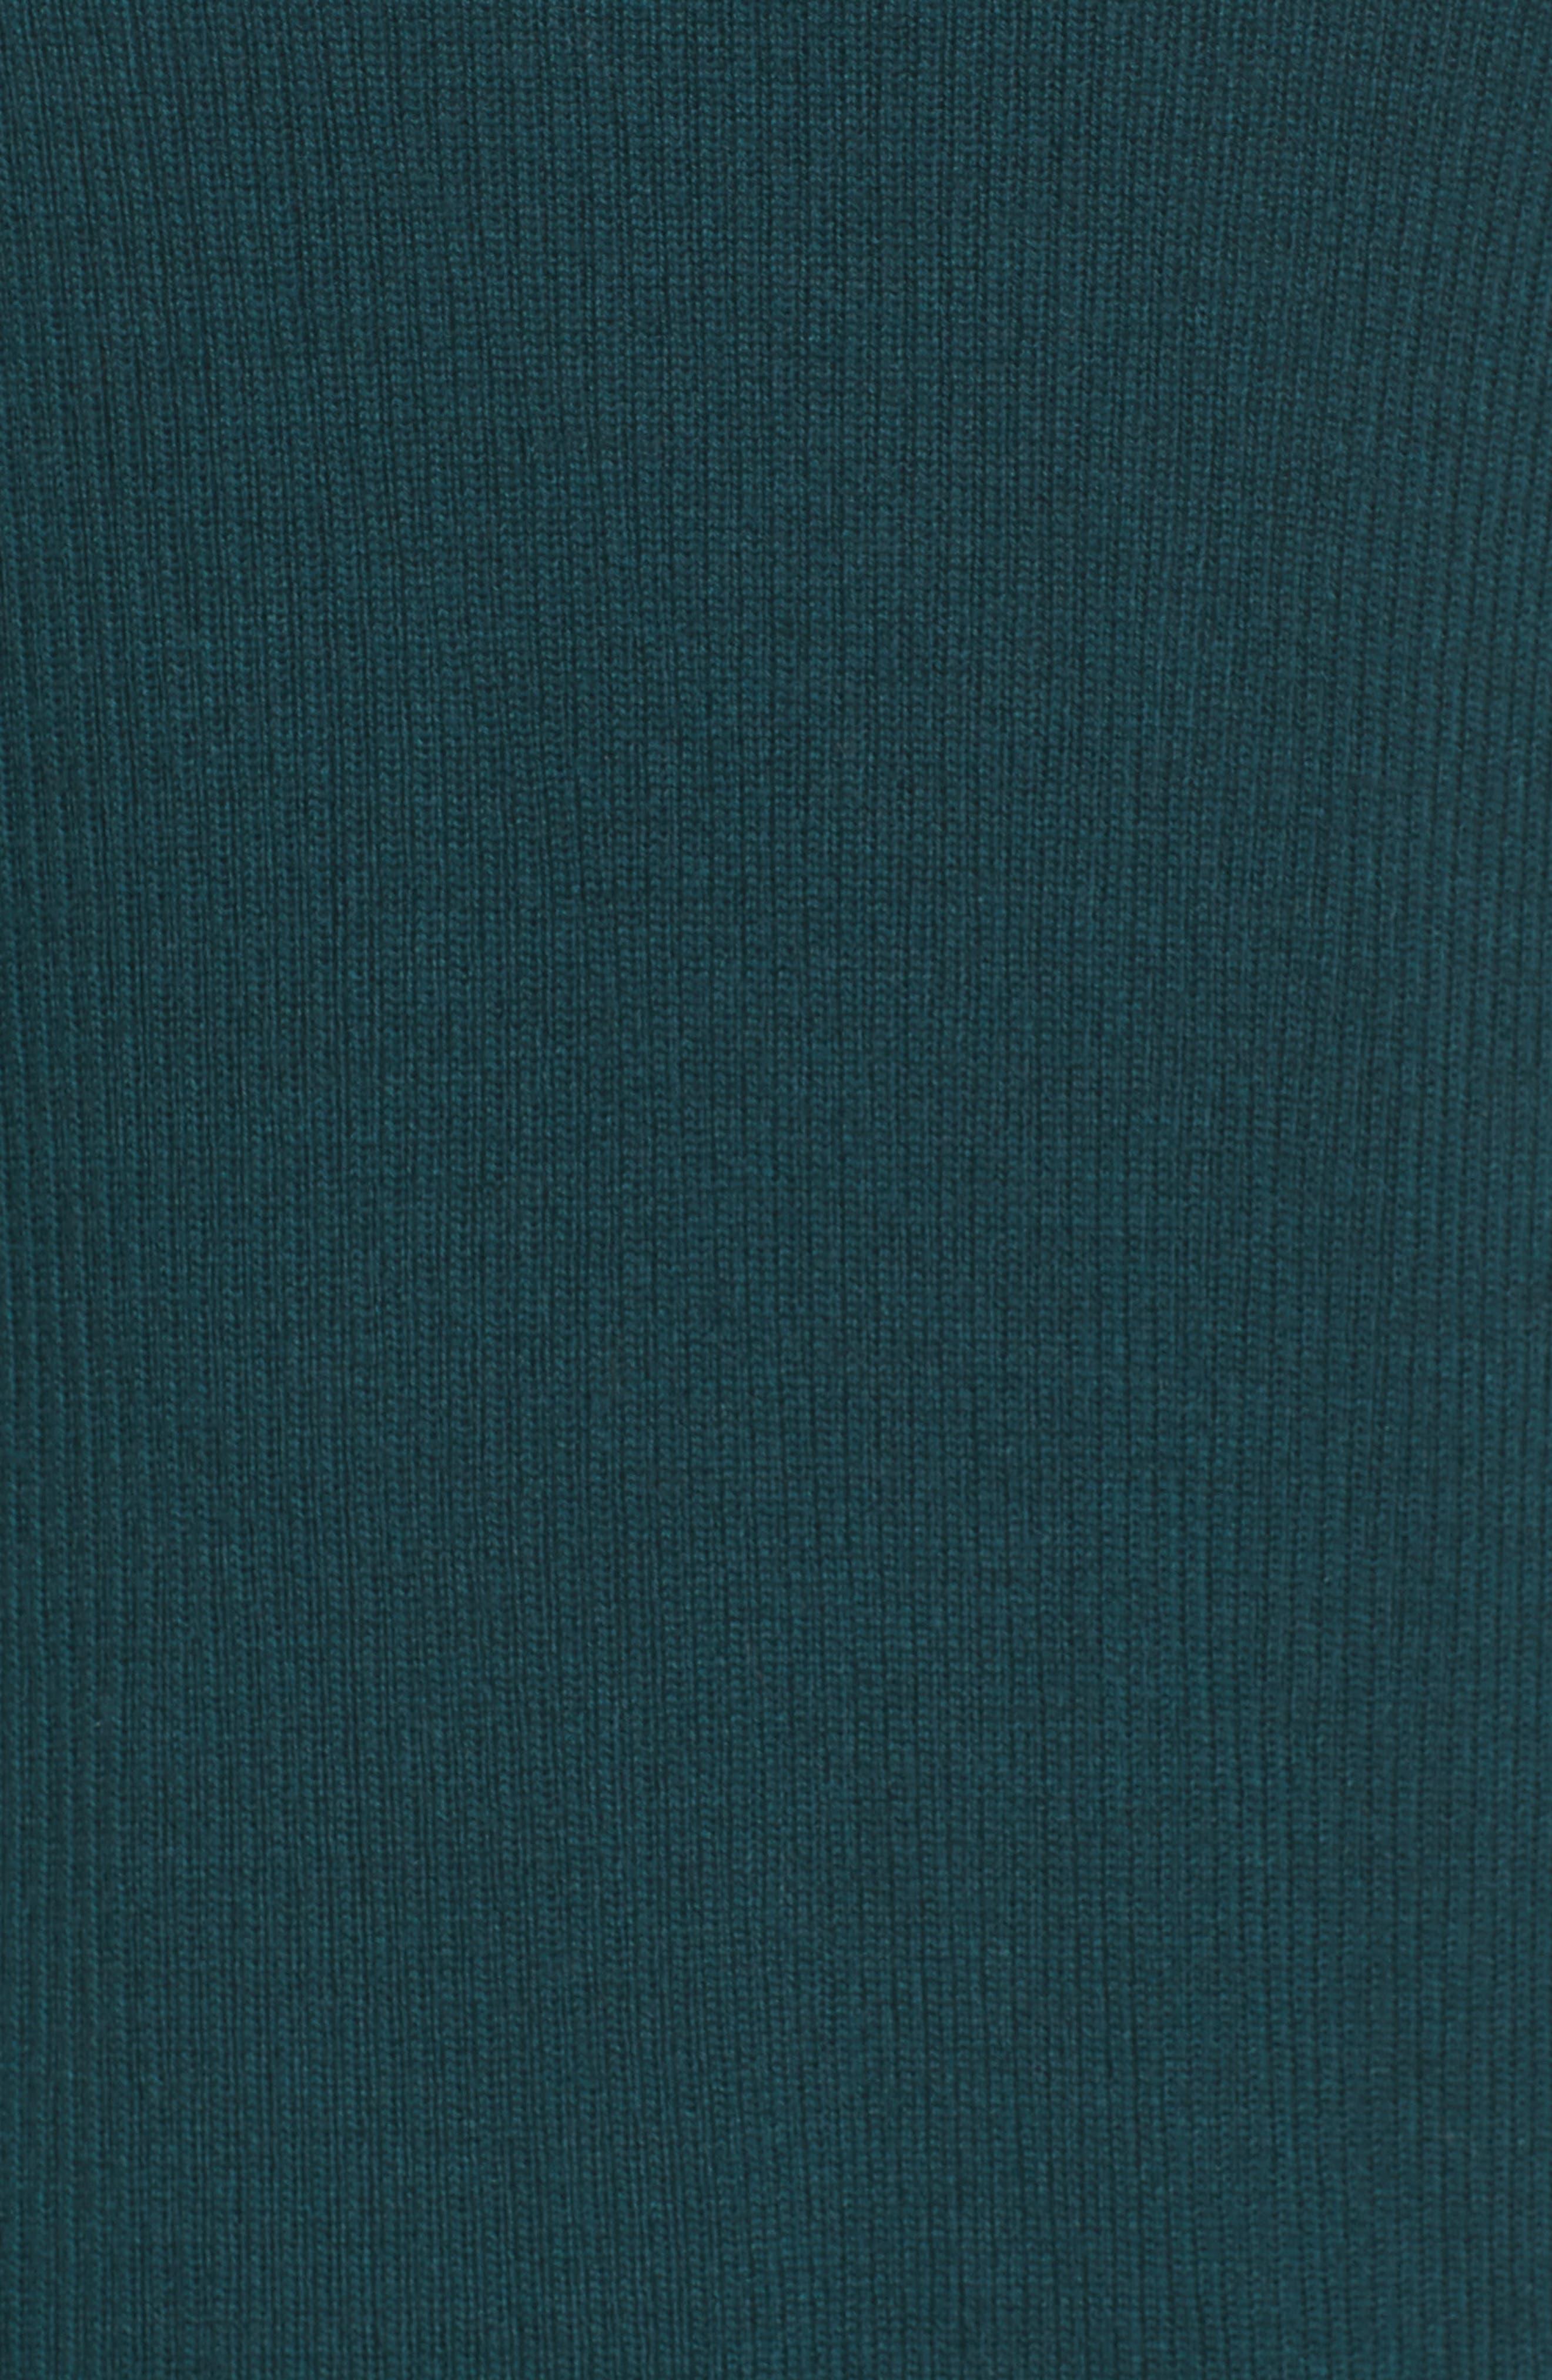 Rib Knit Wool Blend Cardigan,                             Alternate thumbnail 87, color,